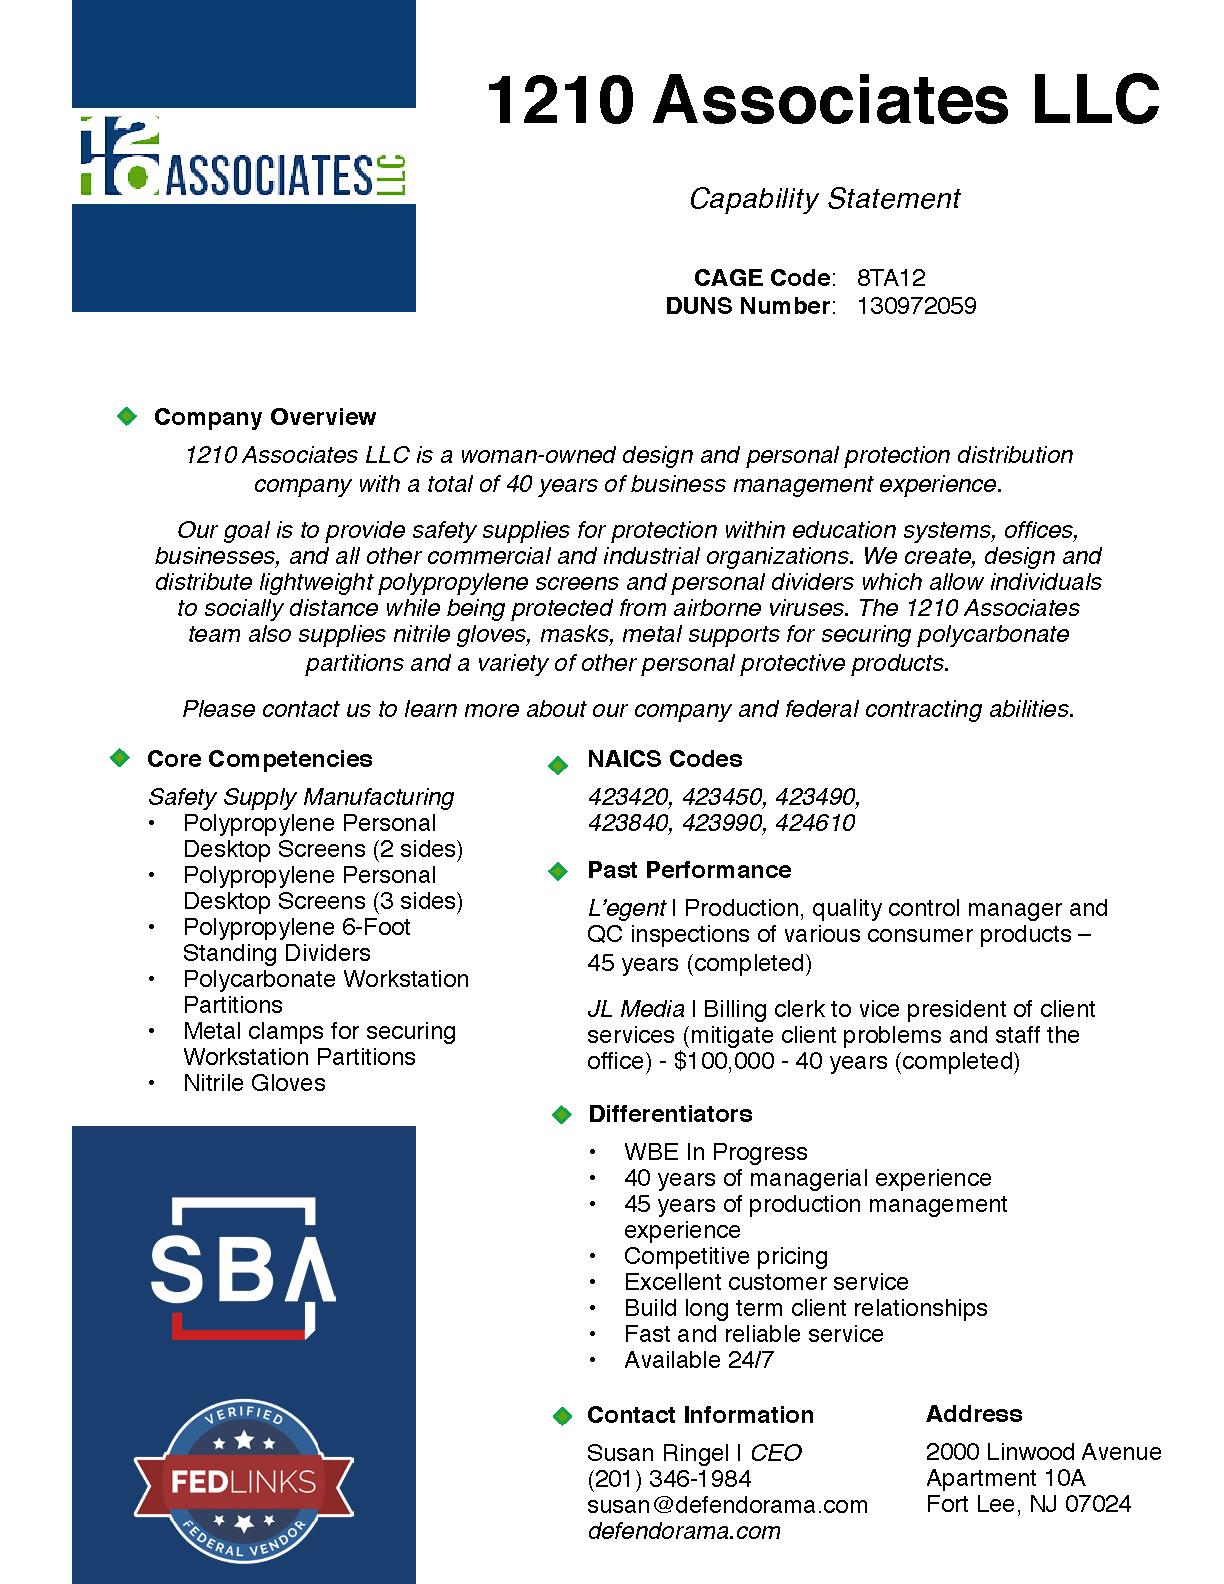 1210 associates llc capability statement